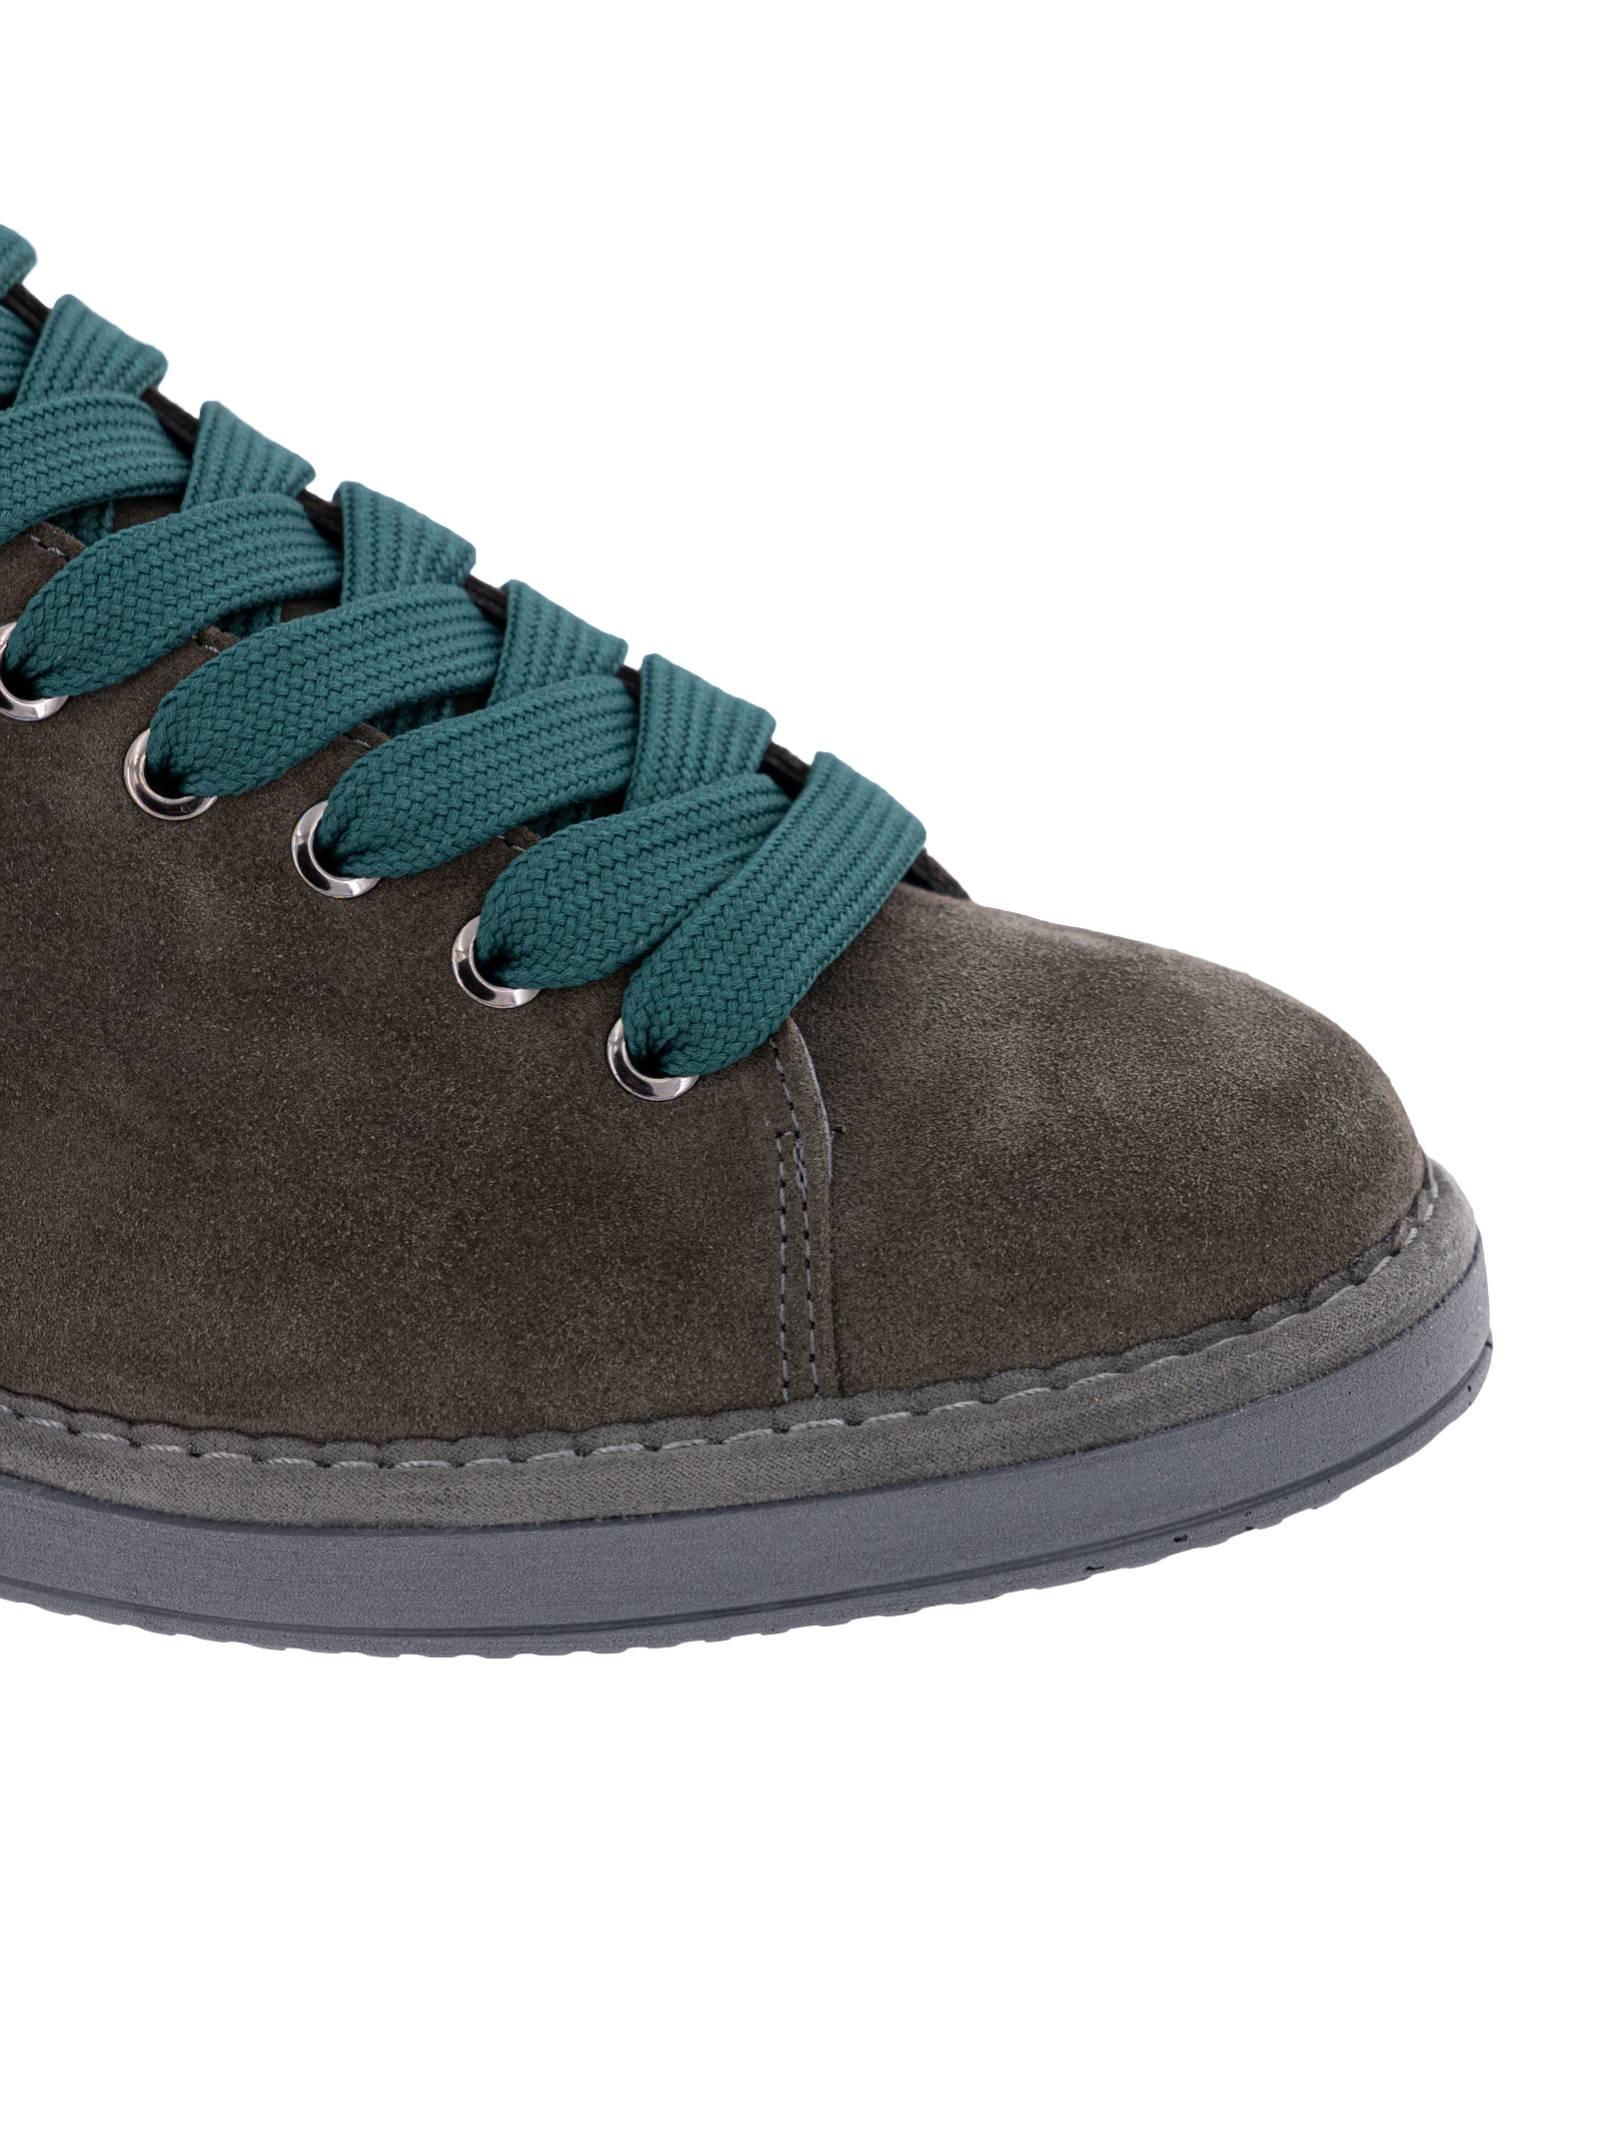 Ankle boot Panchic PANCHIC | 5032235 | P01M14002S5CLPET